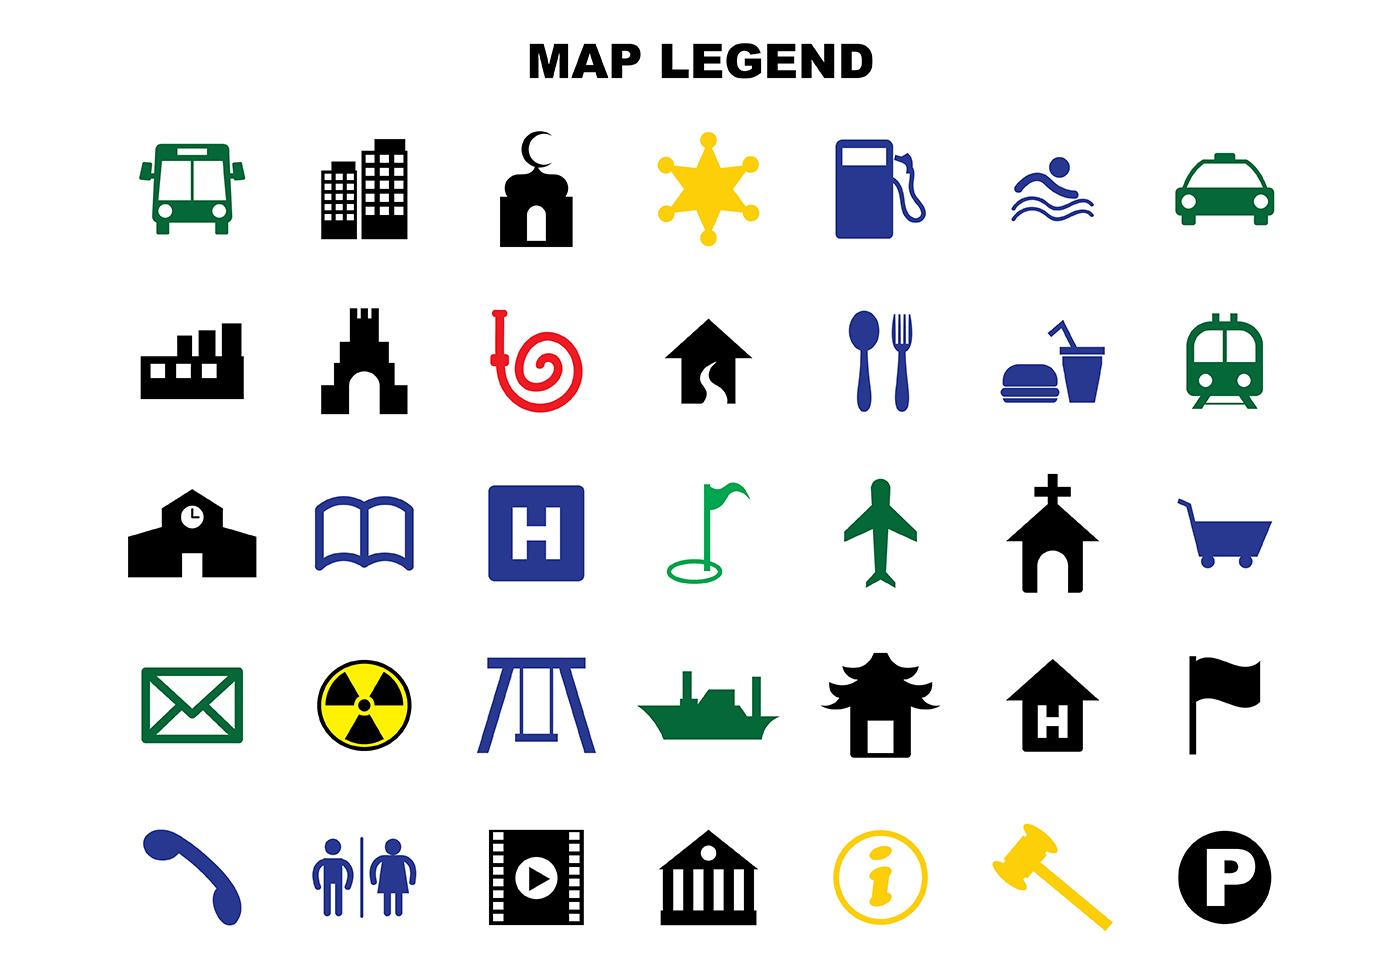 Map Legend Symbols Free Vector Art 26 Free Downloads